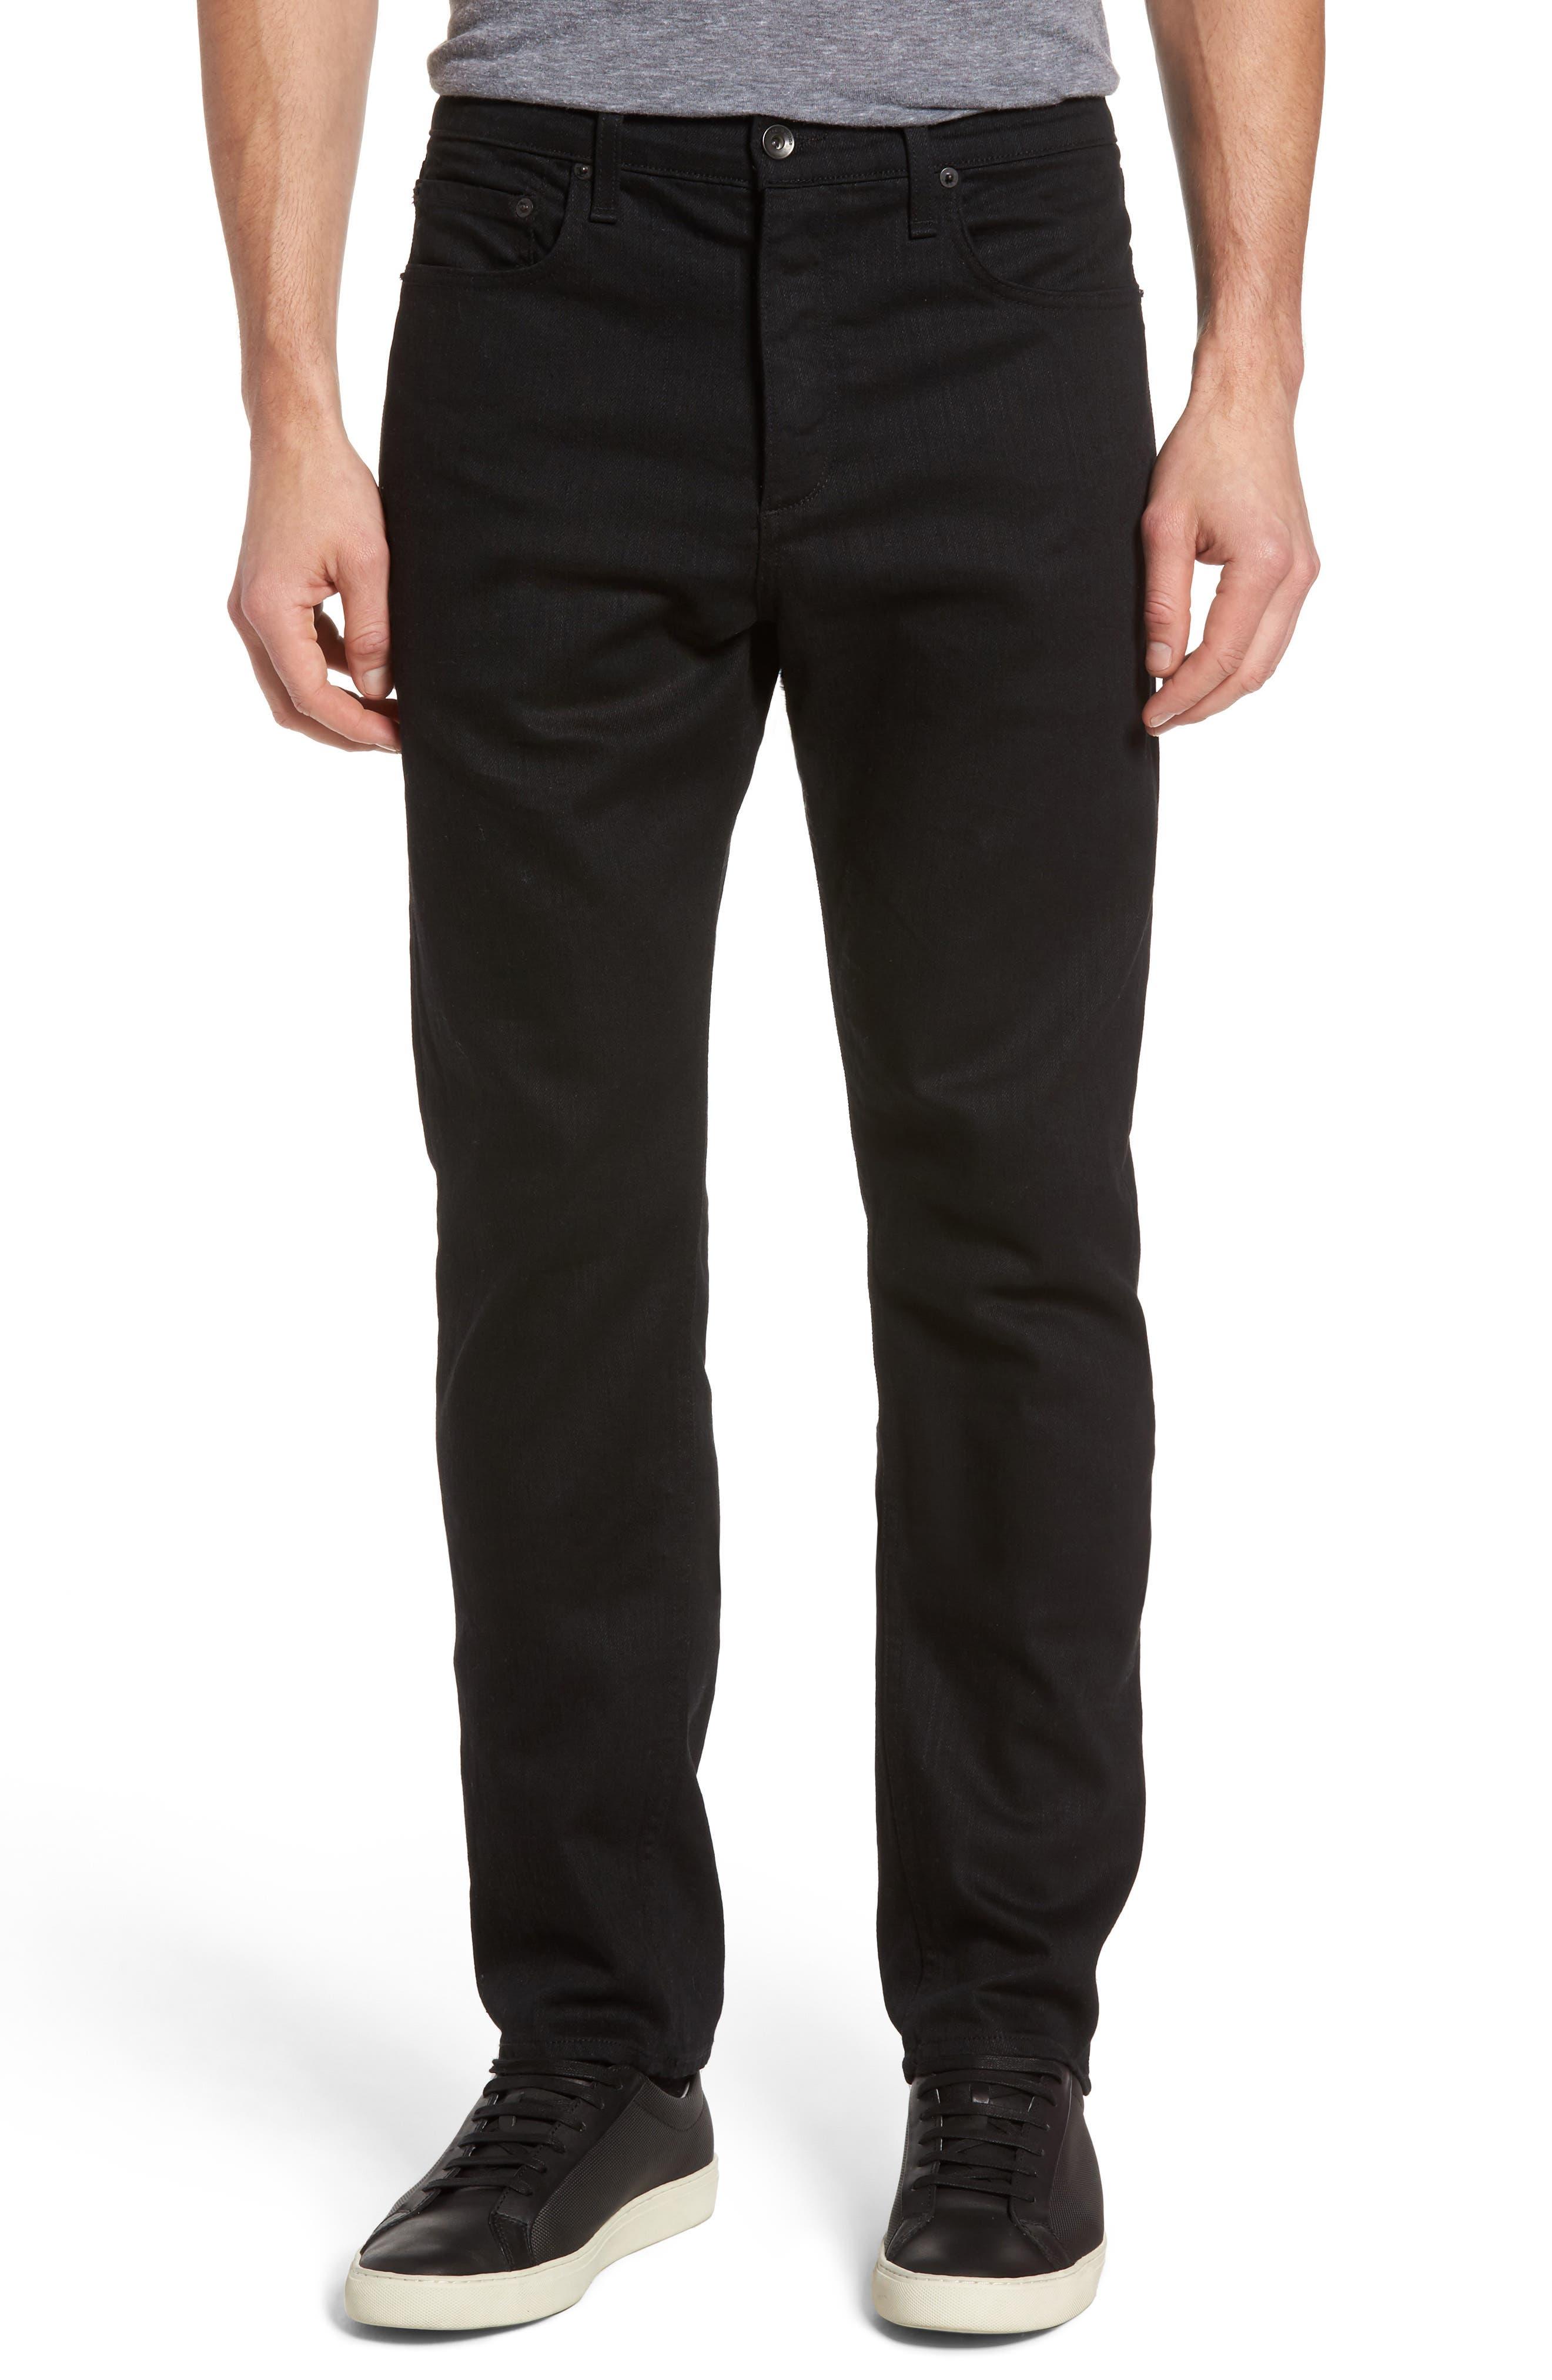 RAG & BONE Fit 3 Slim Straight Leg Jeans, Main, color, BLACK